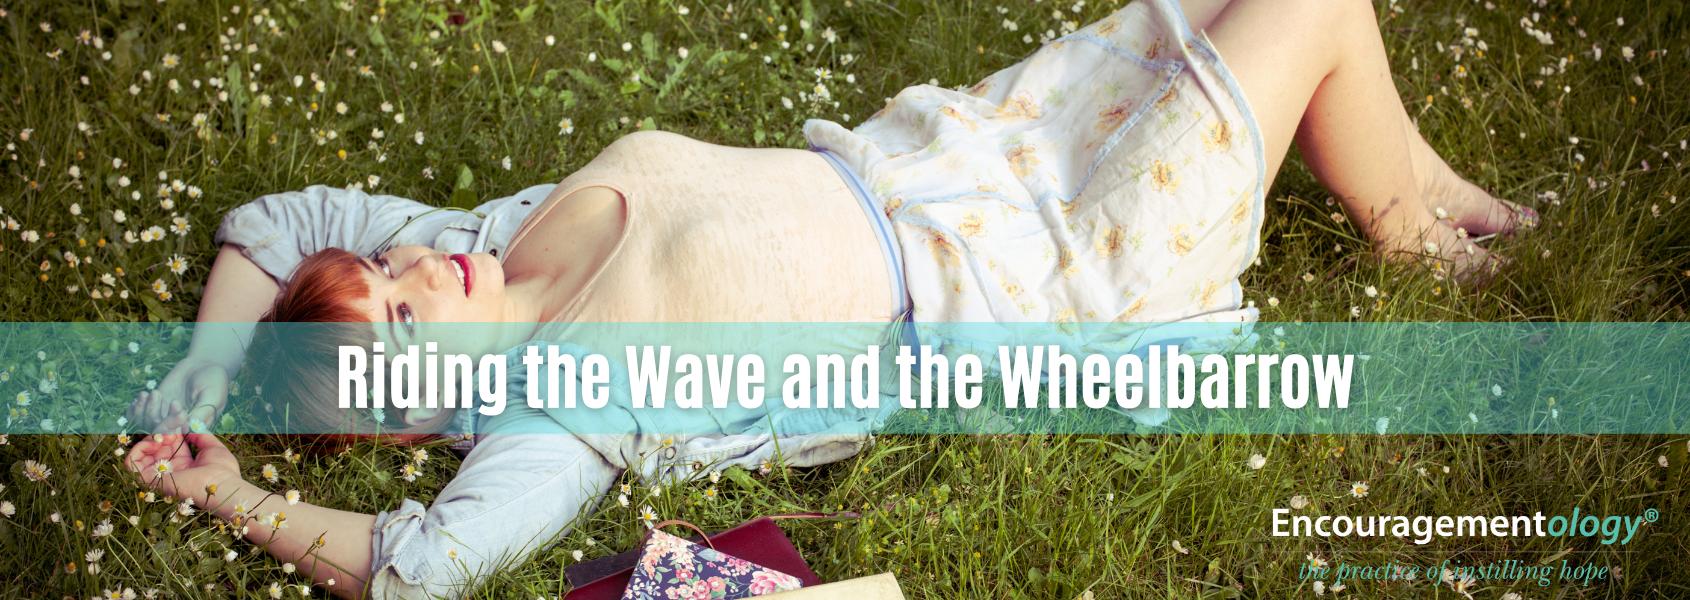 Riding the Wave and the Wheelbarrow